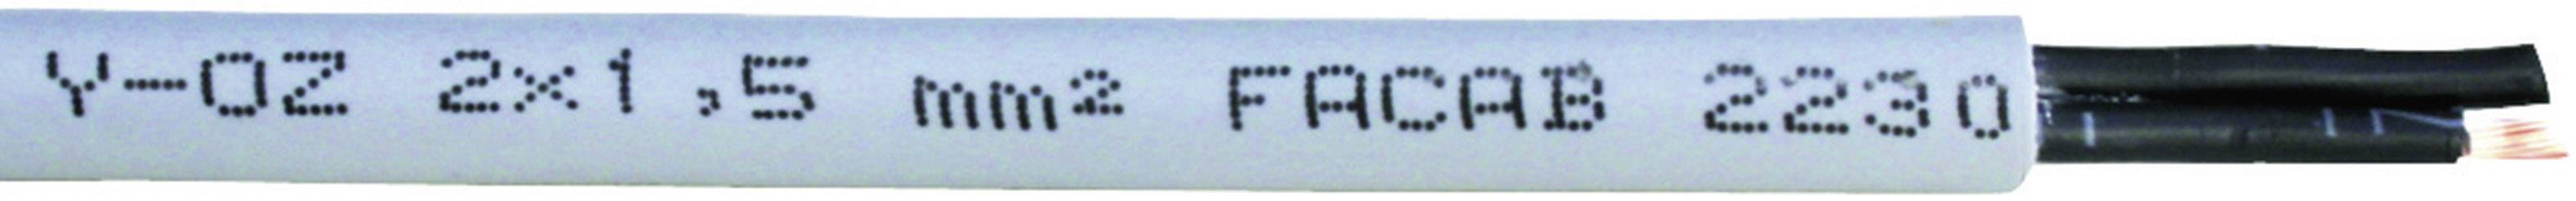 Riadiaci kábel Faber Kabel YSLY-OZ 030631, 5 x 1.50 mm², vonkajší Ø 8.10 mm, 500 V, metrový tovar, sivá